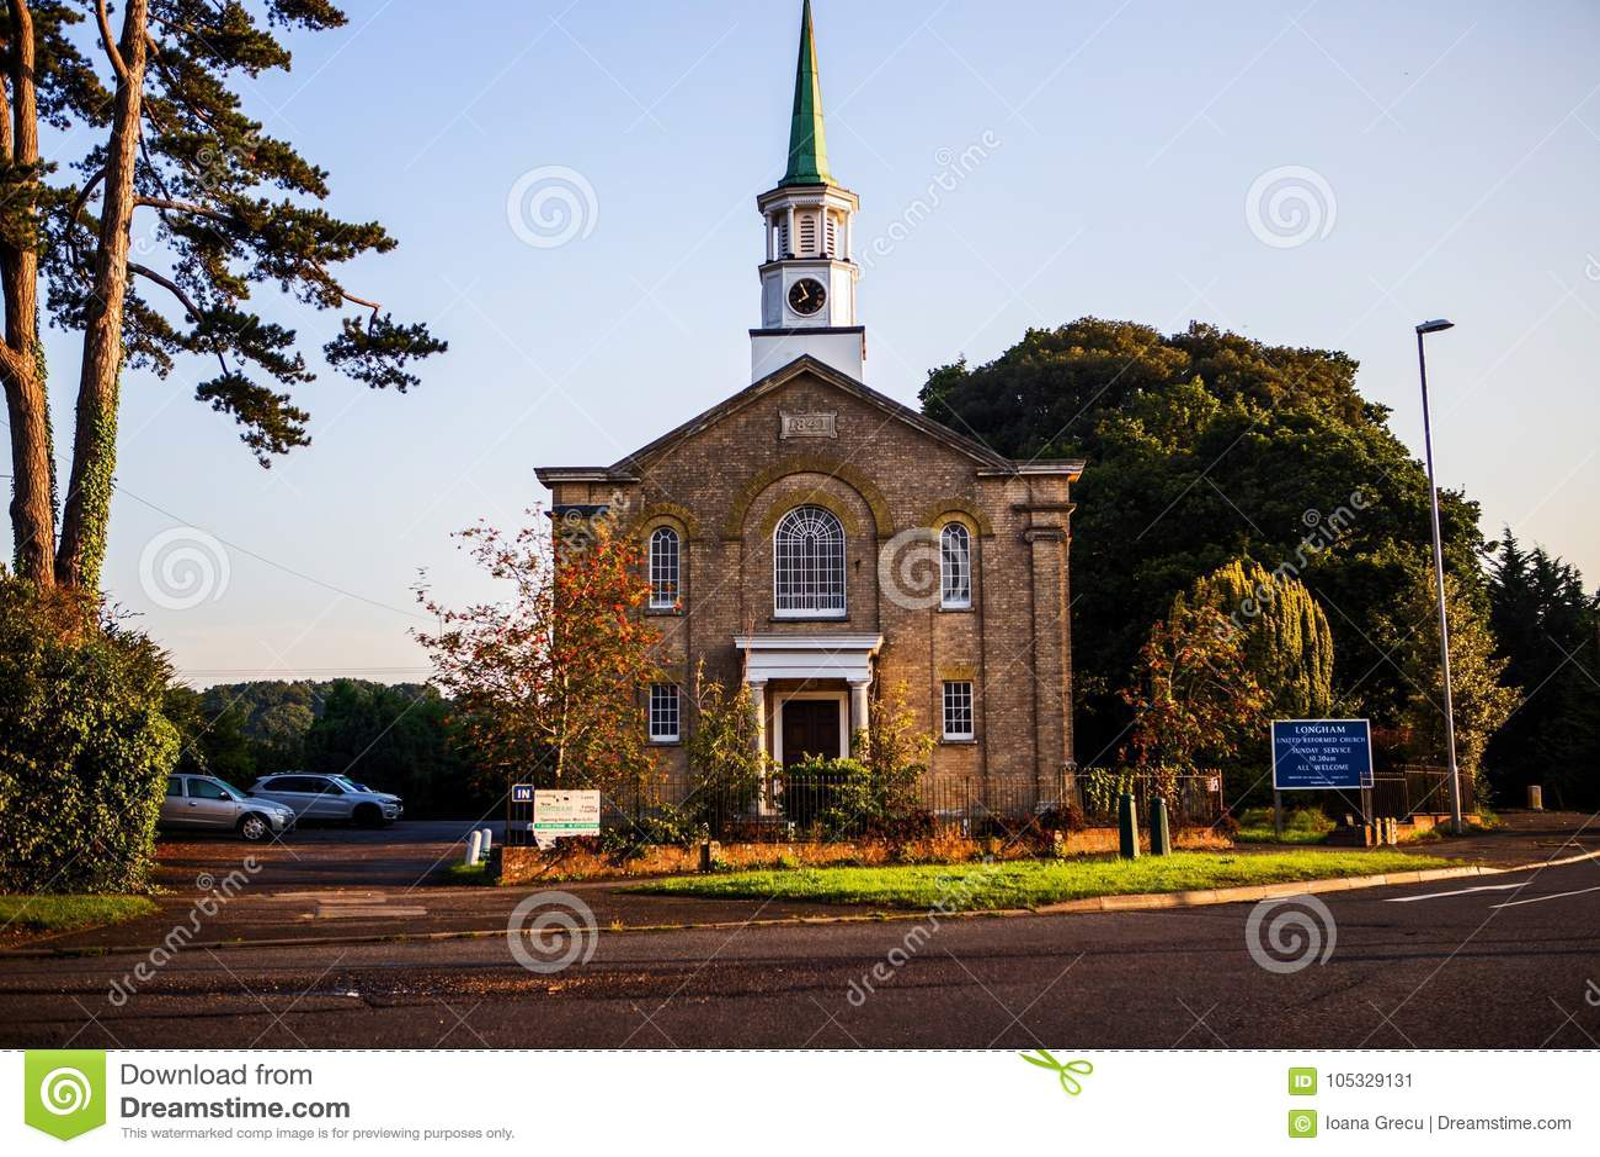 United reformed church in Longham, Wales